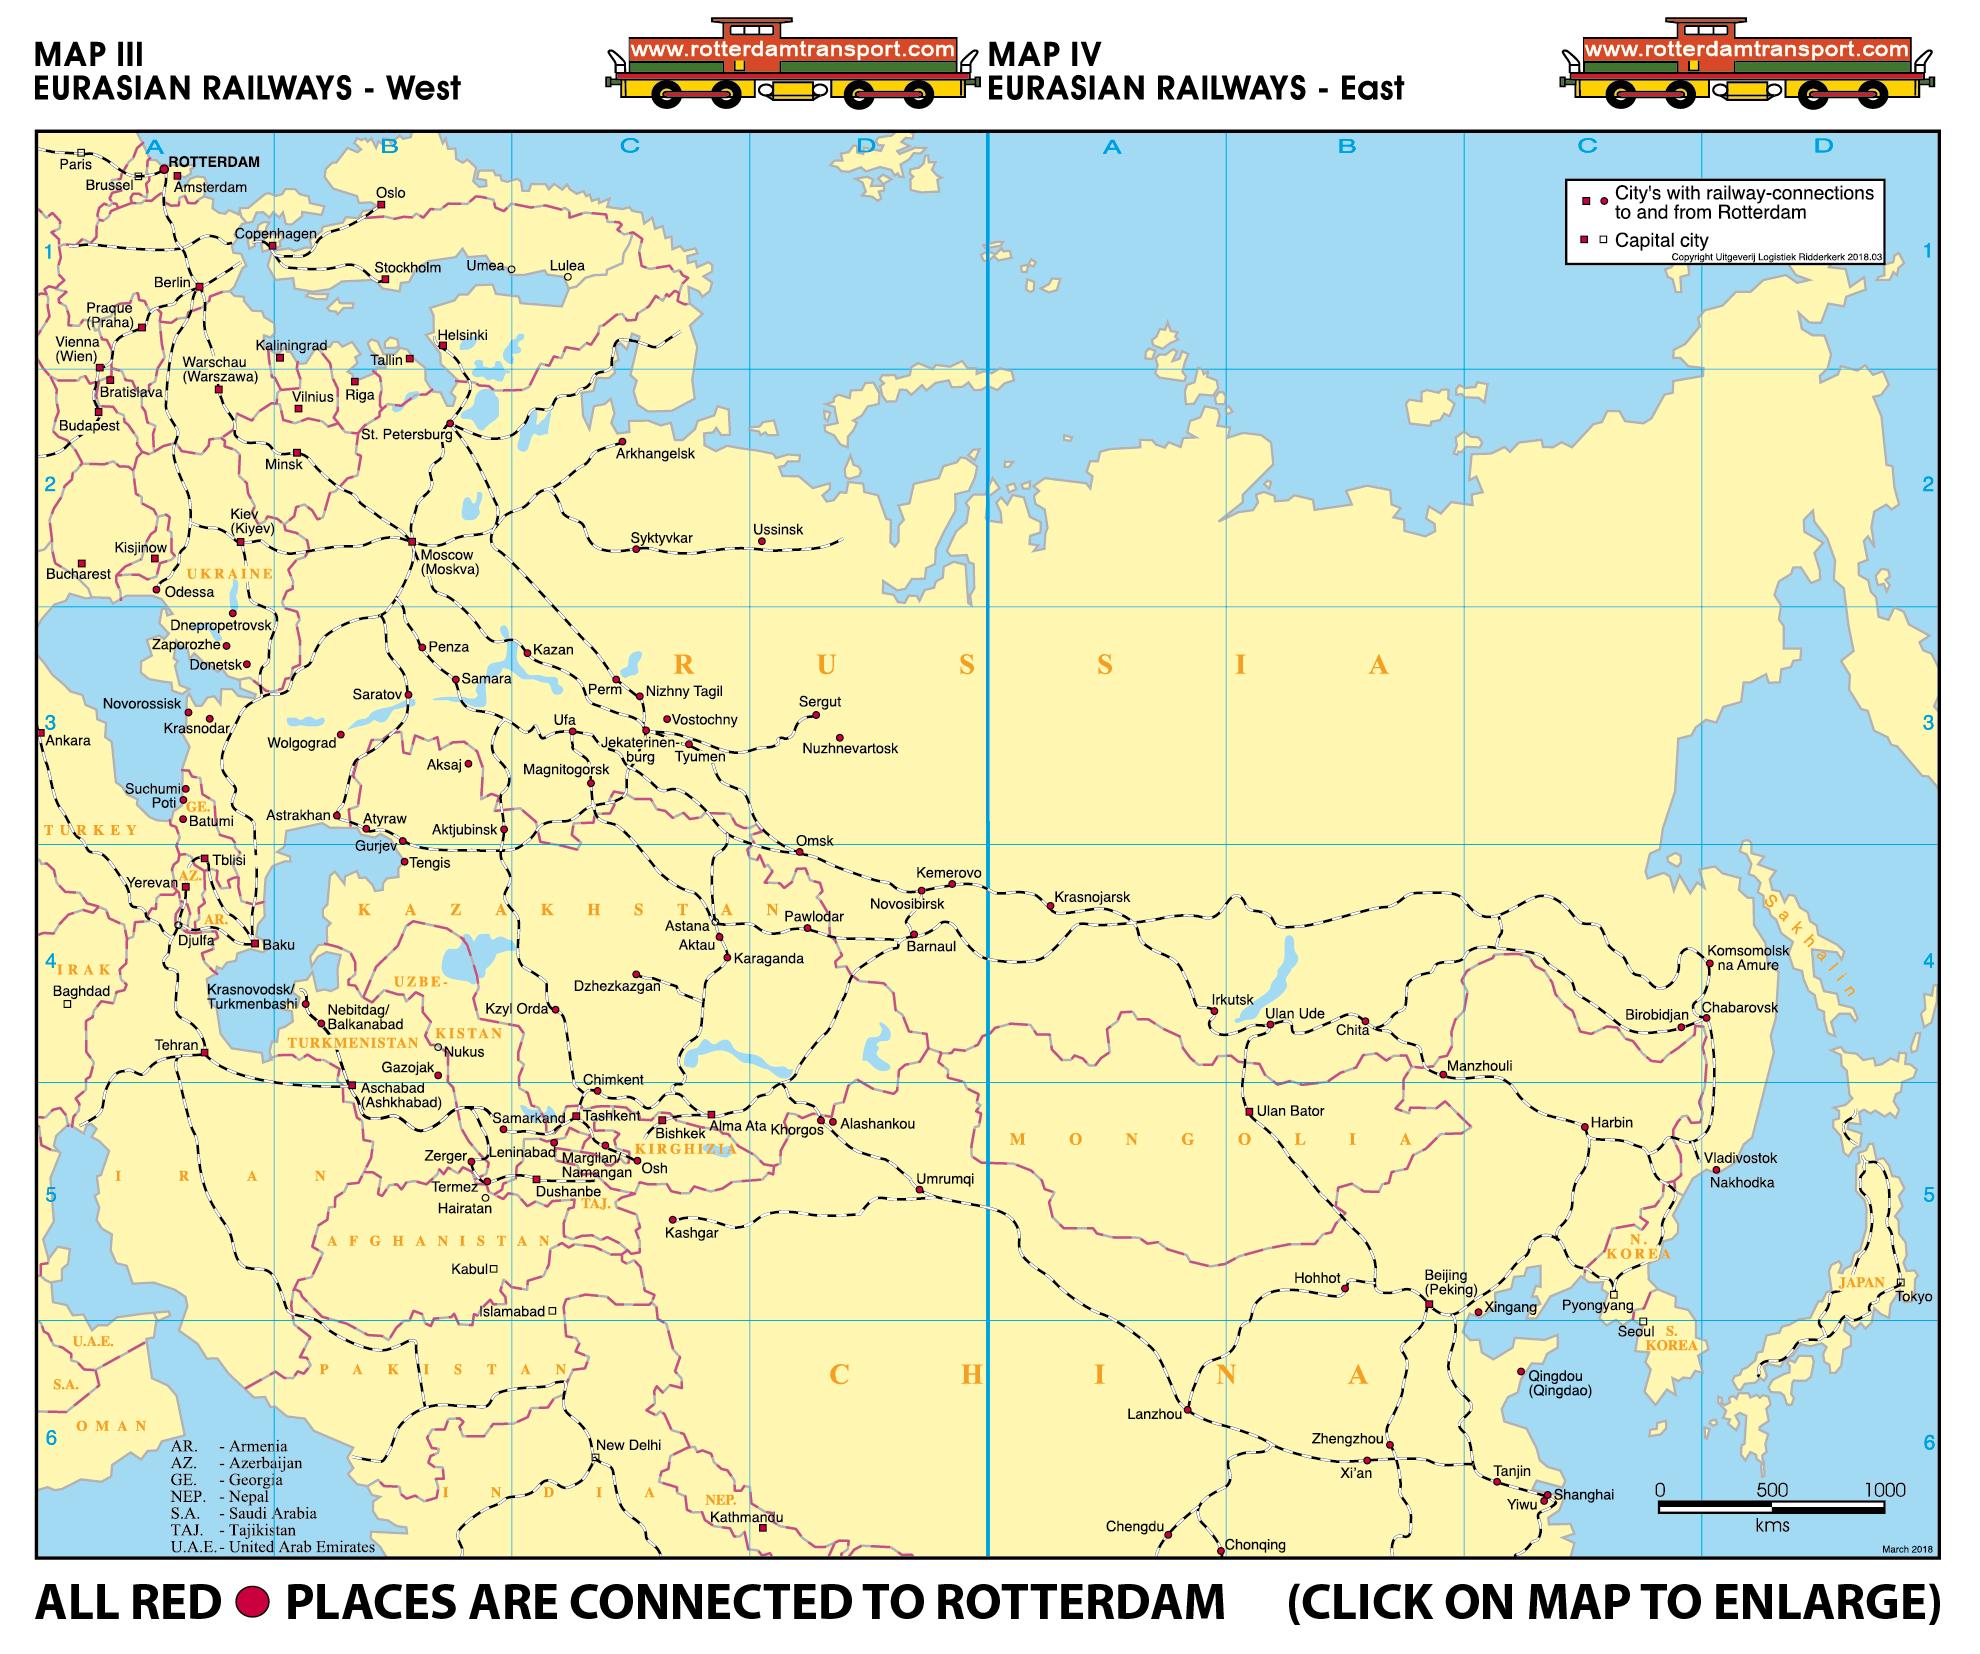 www rotterdamtransport com - maps railway traffic